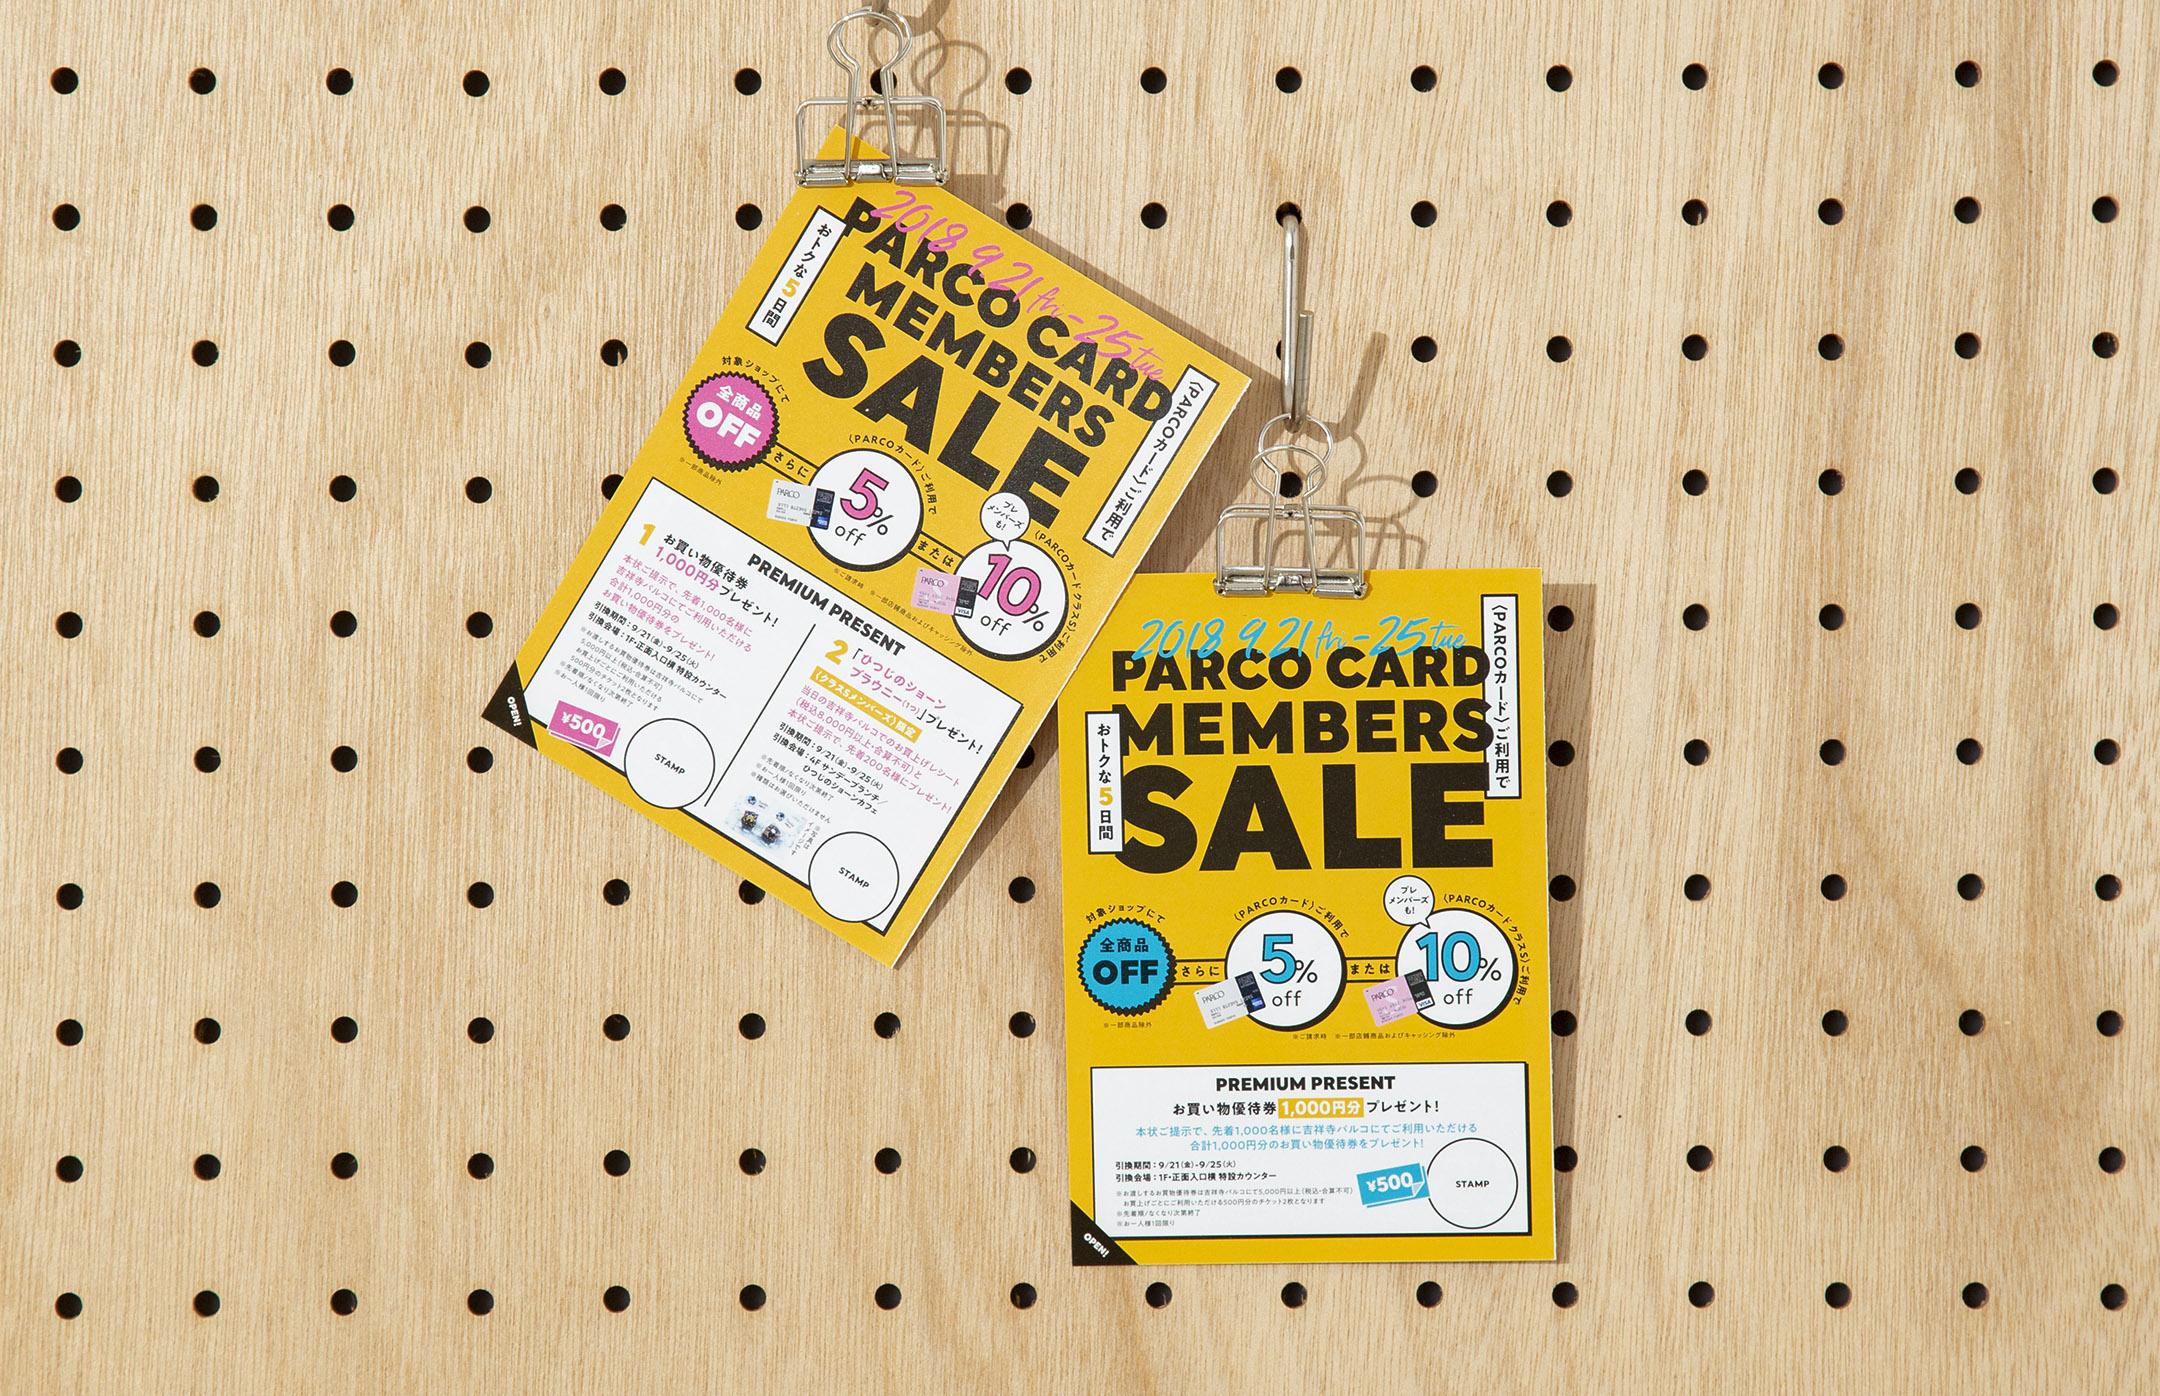 "KICHIJOJI PARCO ""PARCO CARD MEMBERS SALE"" image visual & DM design"